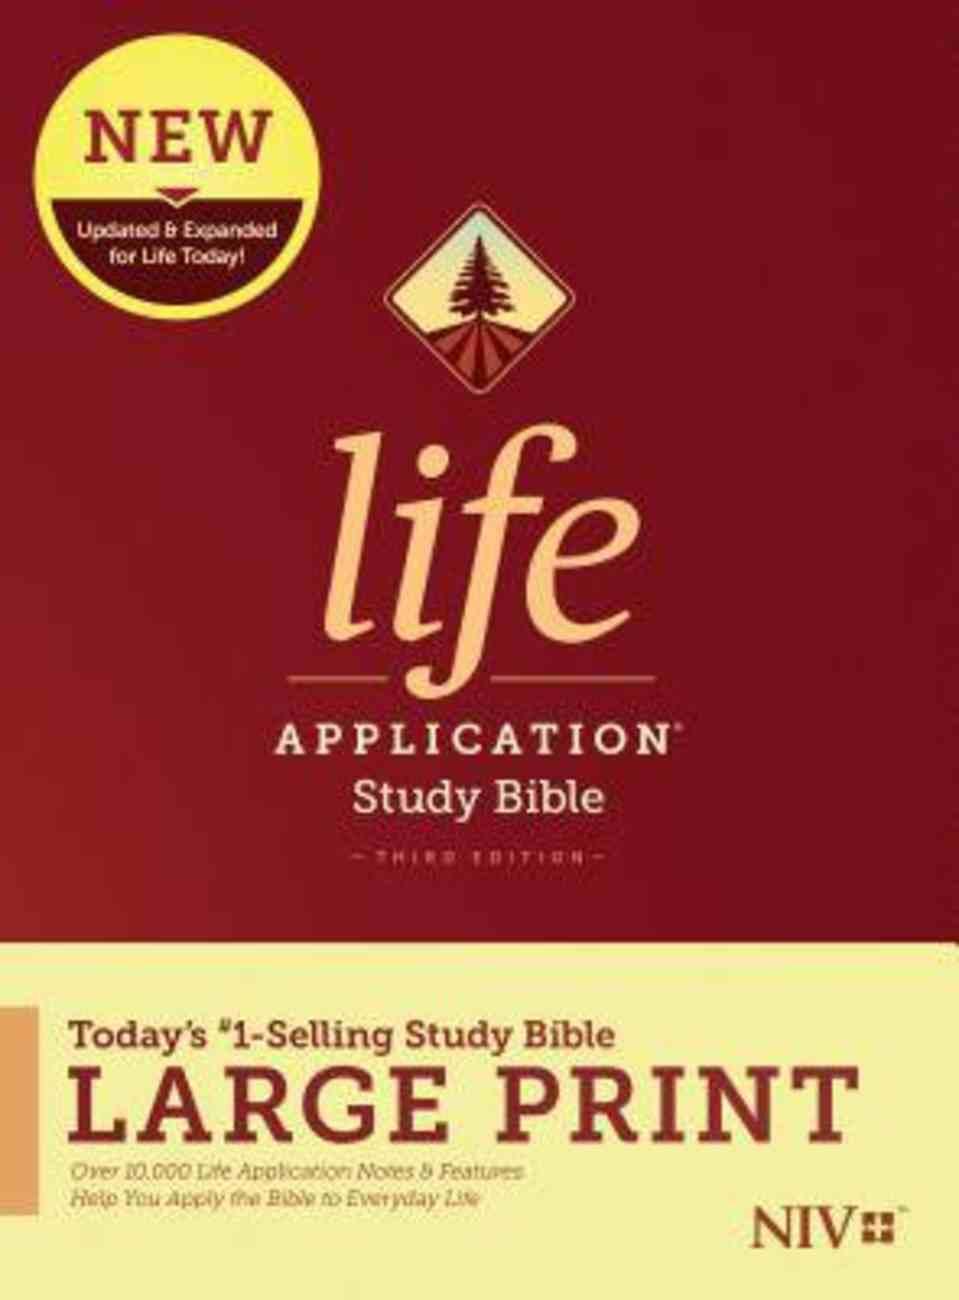 NIV Life Application Study Bible Third Edition Large Print (Black Letter Edition) Hardback